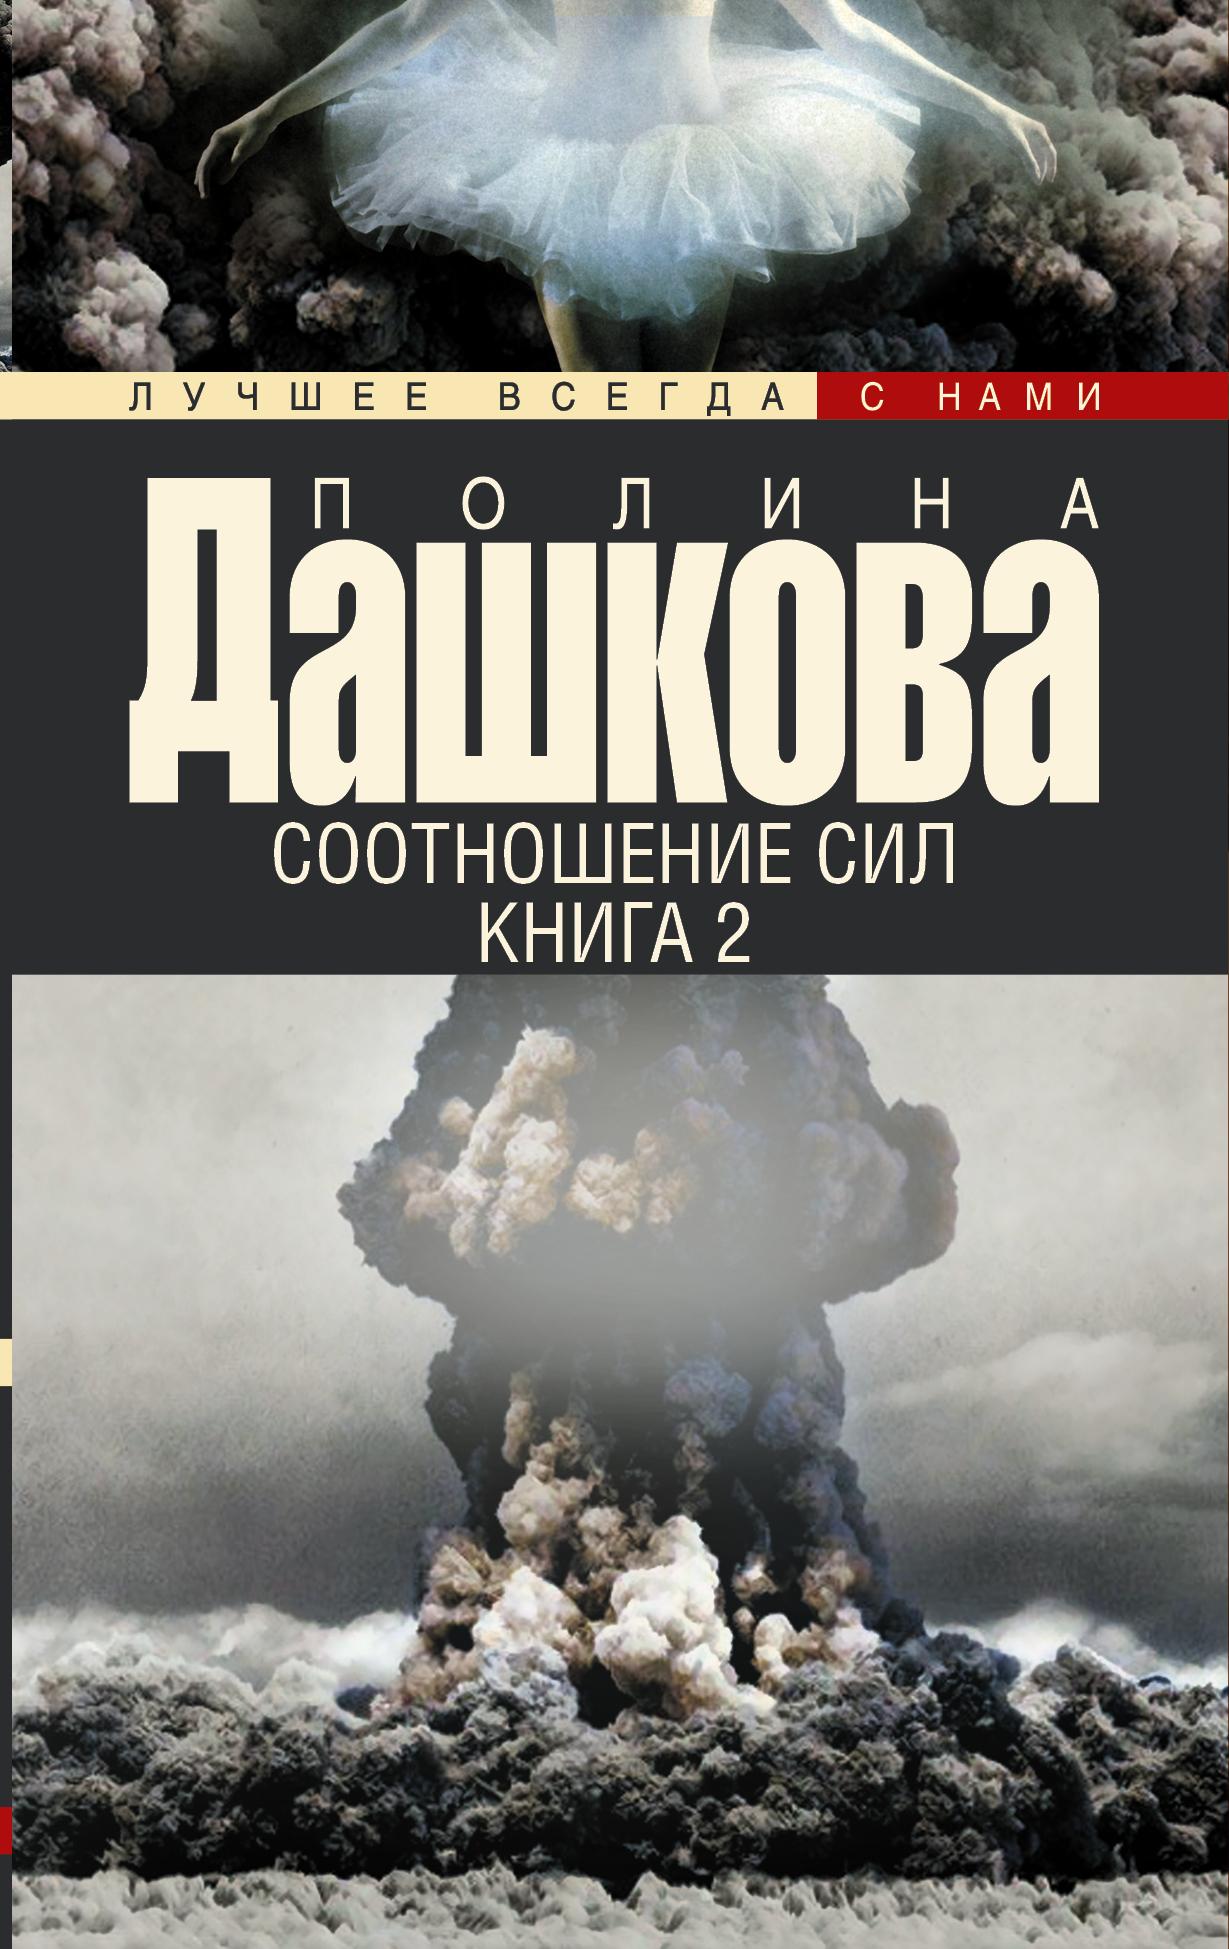 Дашкова П.В. Соотношение сил. Книга 2 дашкова п в соотношение сил